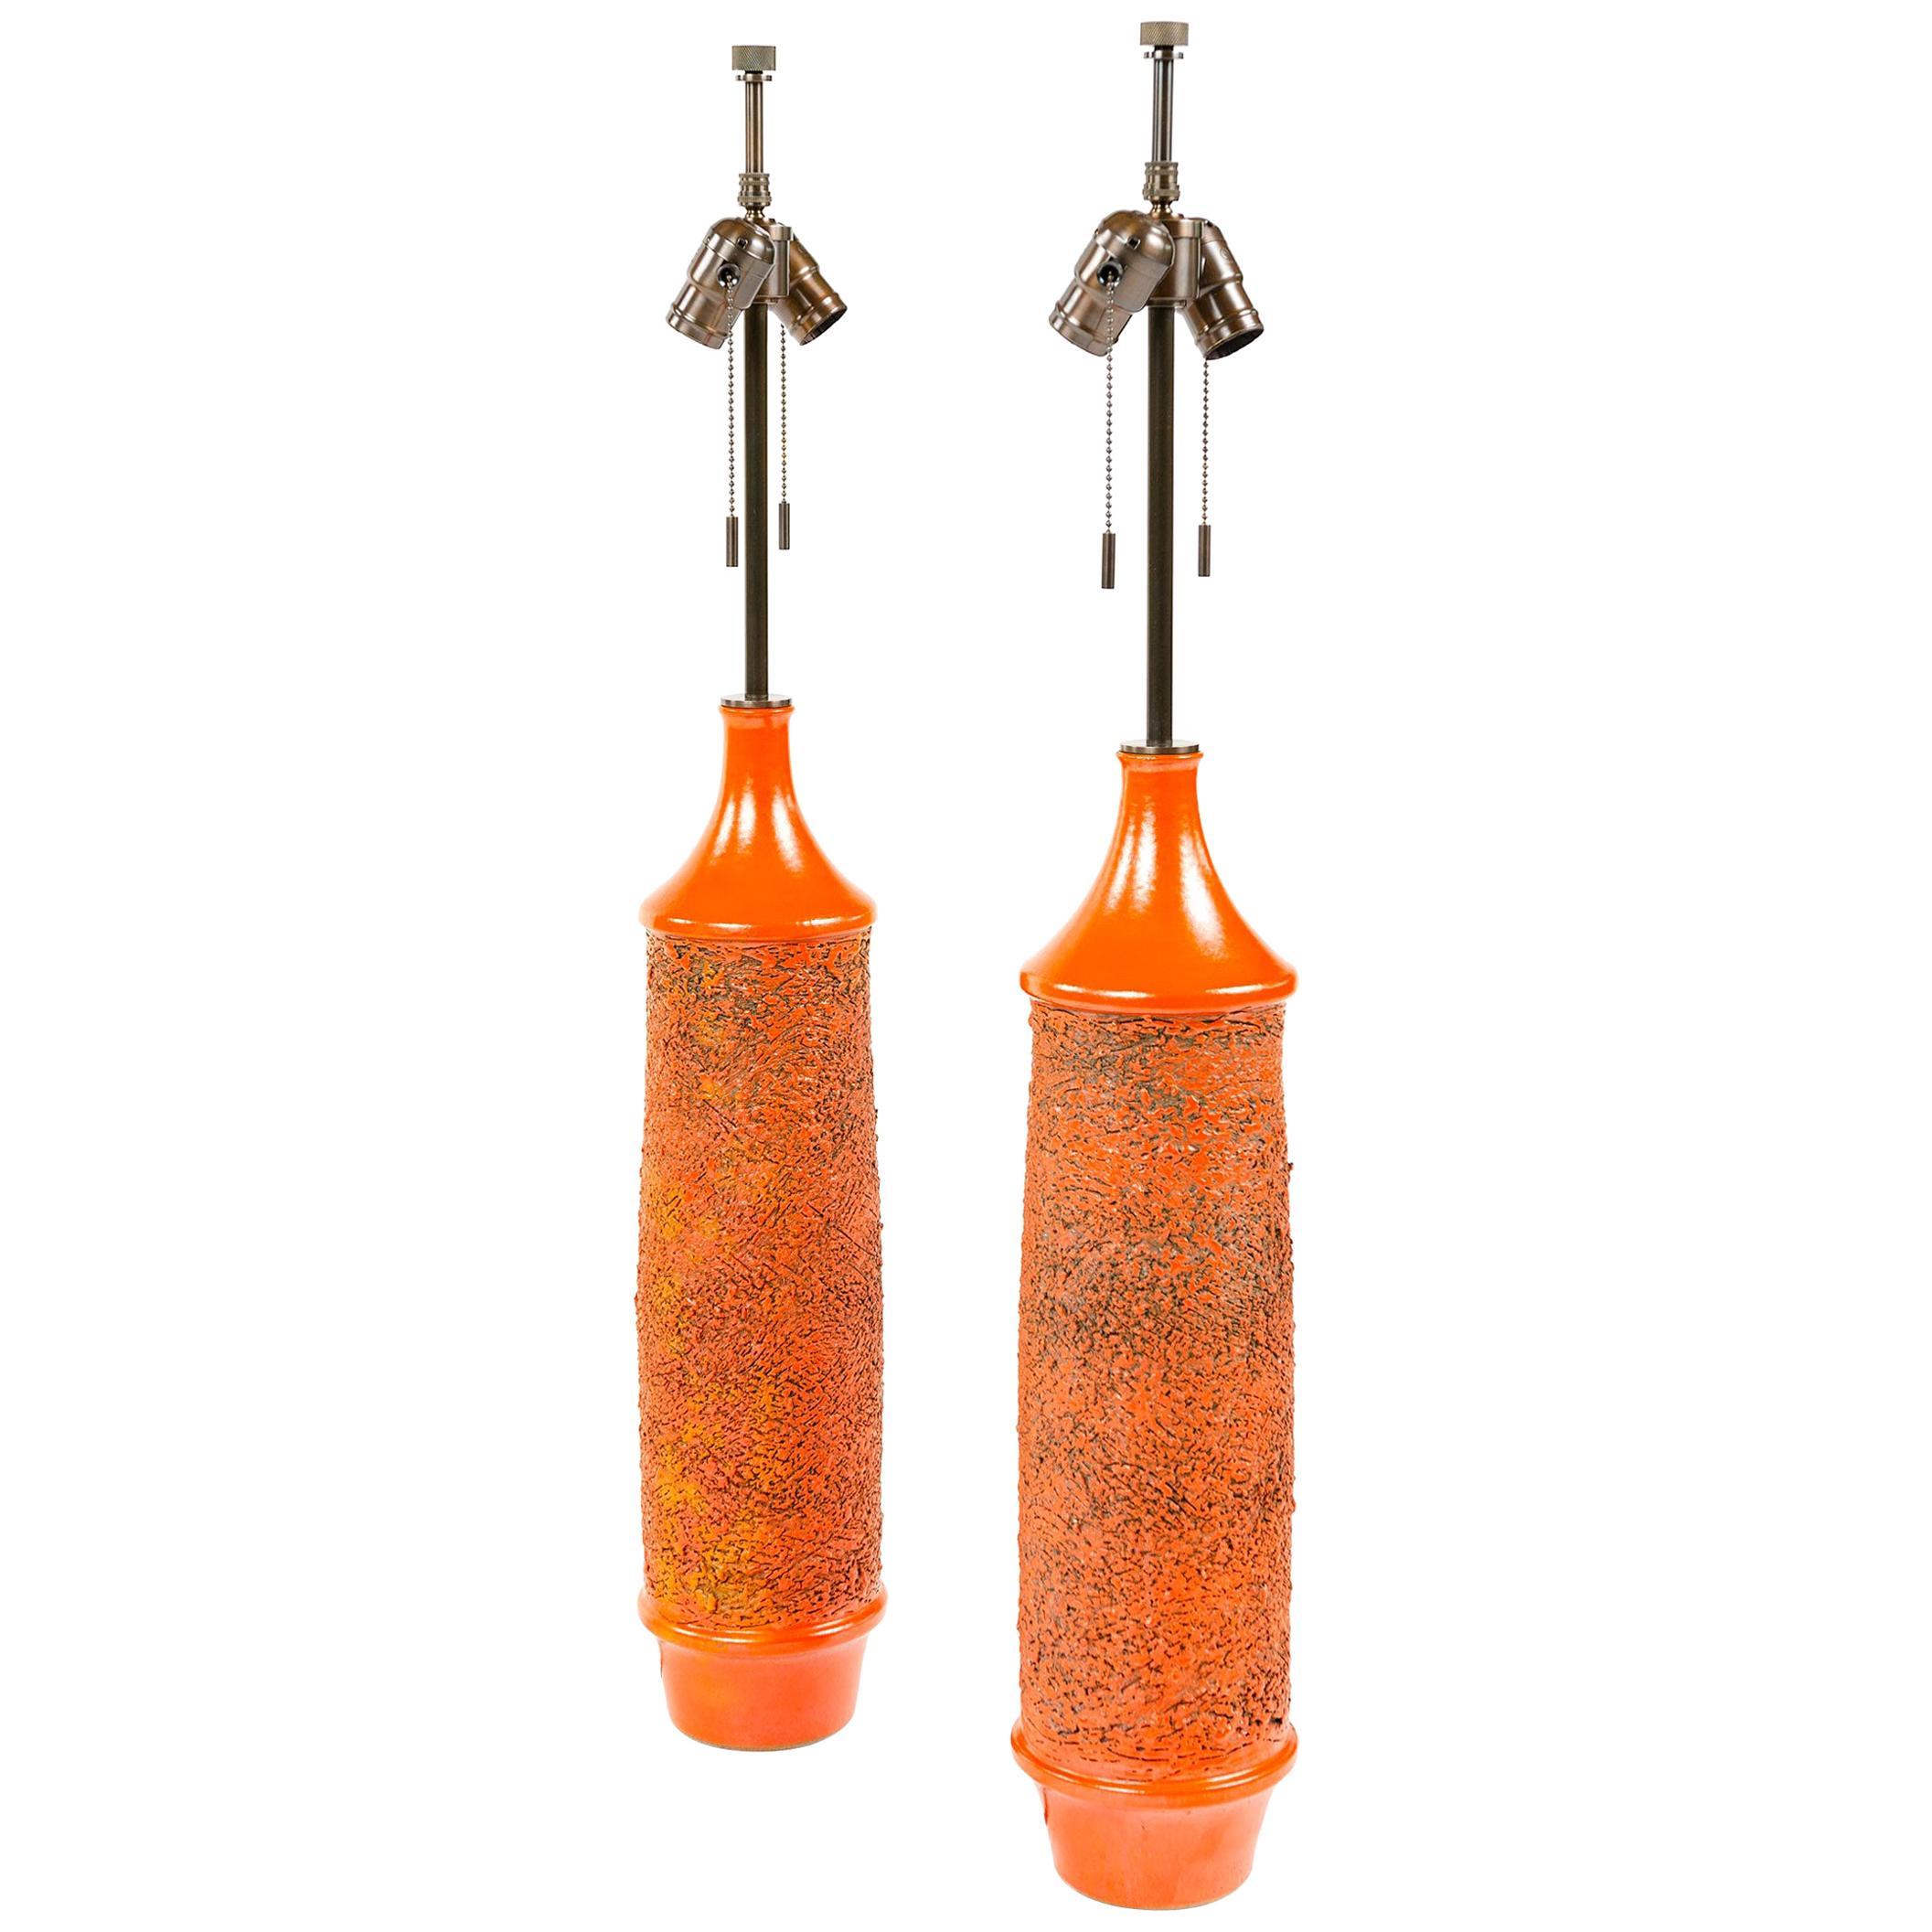 1970s Pair of Red-Orange Ceramic Table Lamps by Lee Rosen for Design Technics